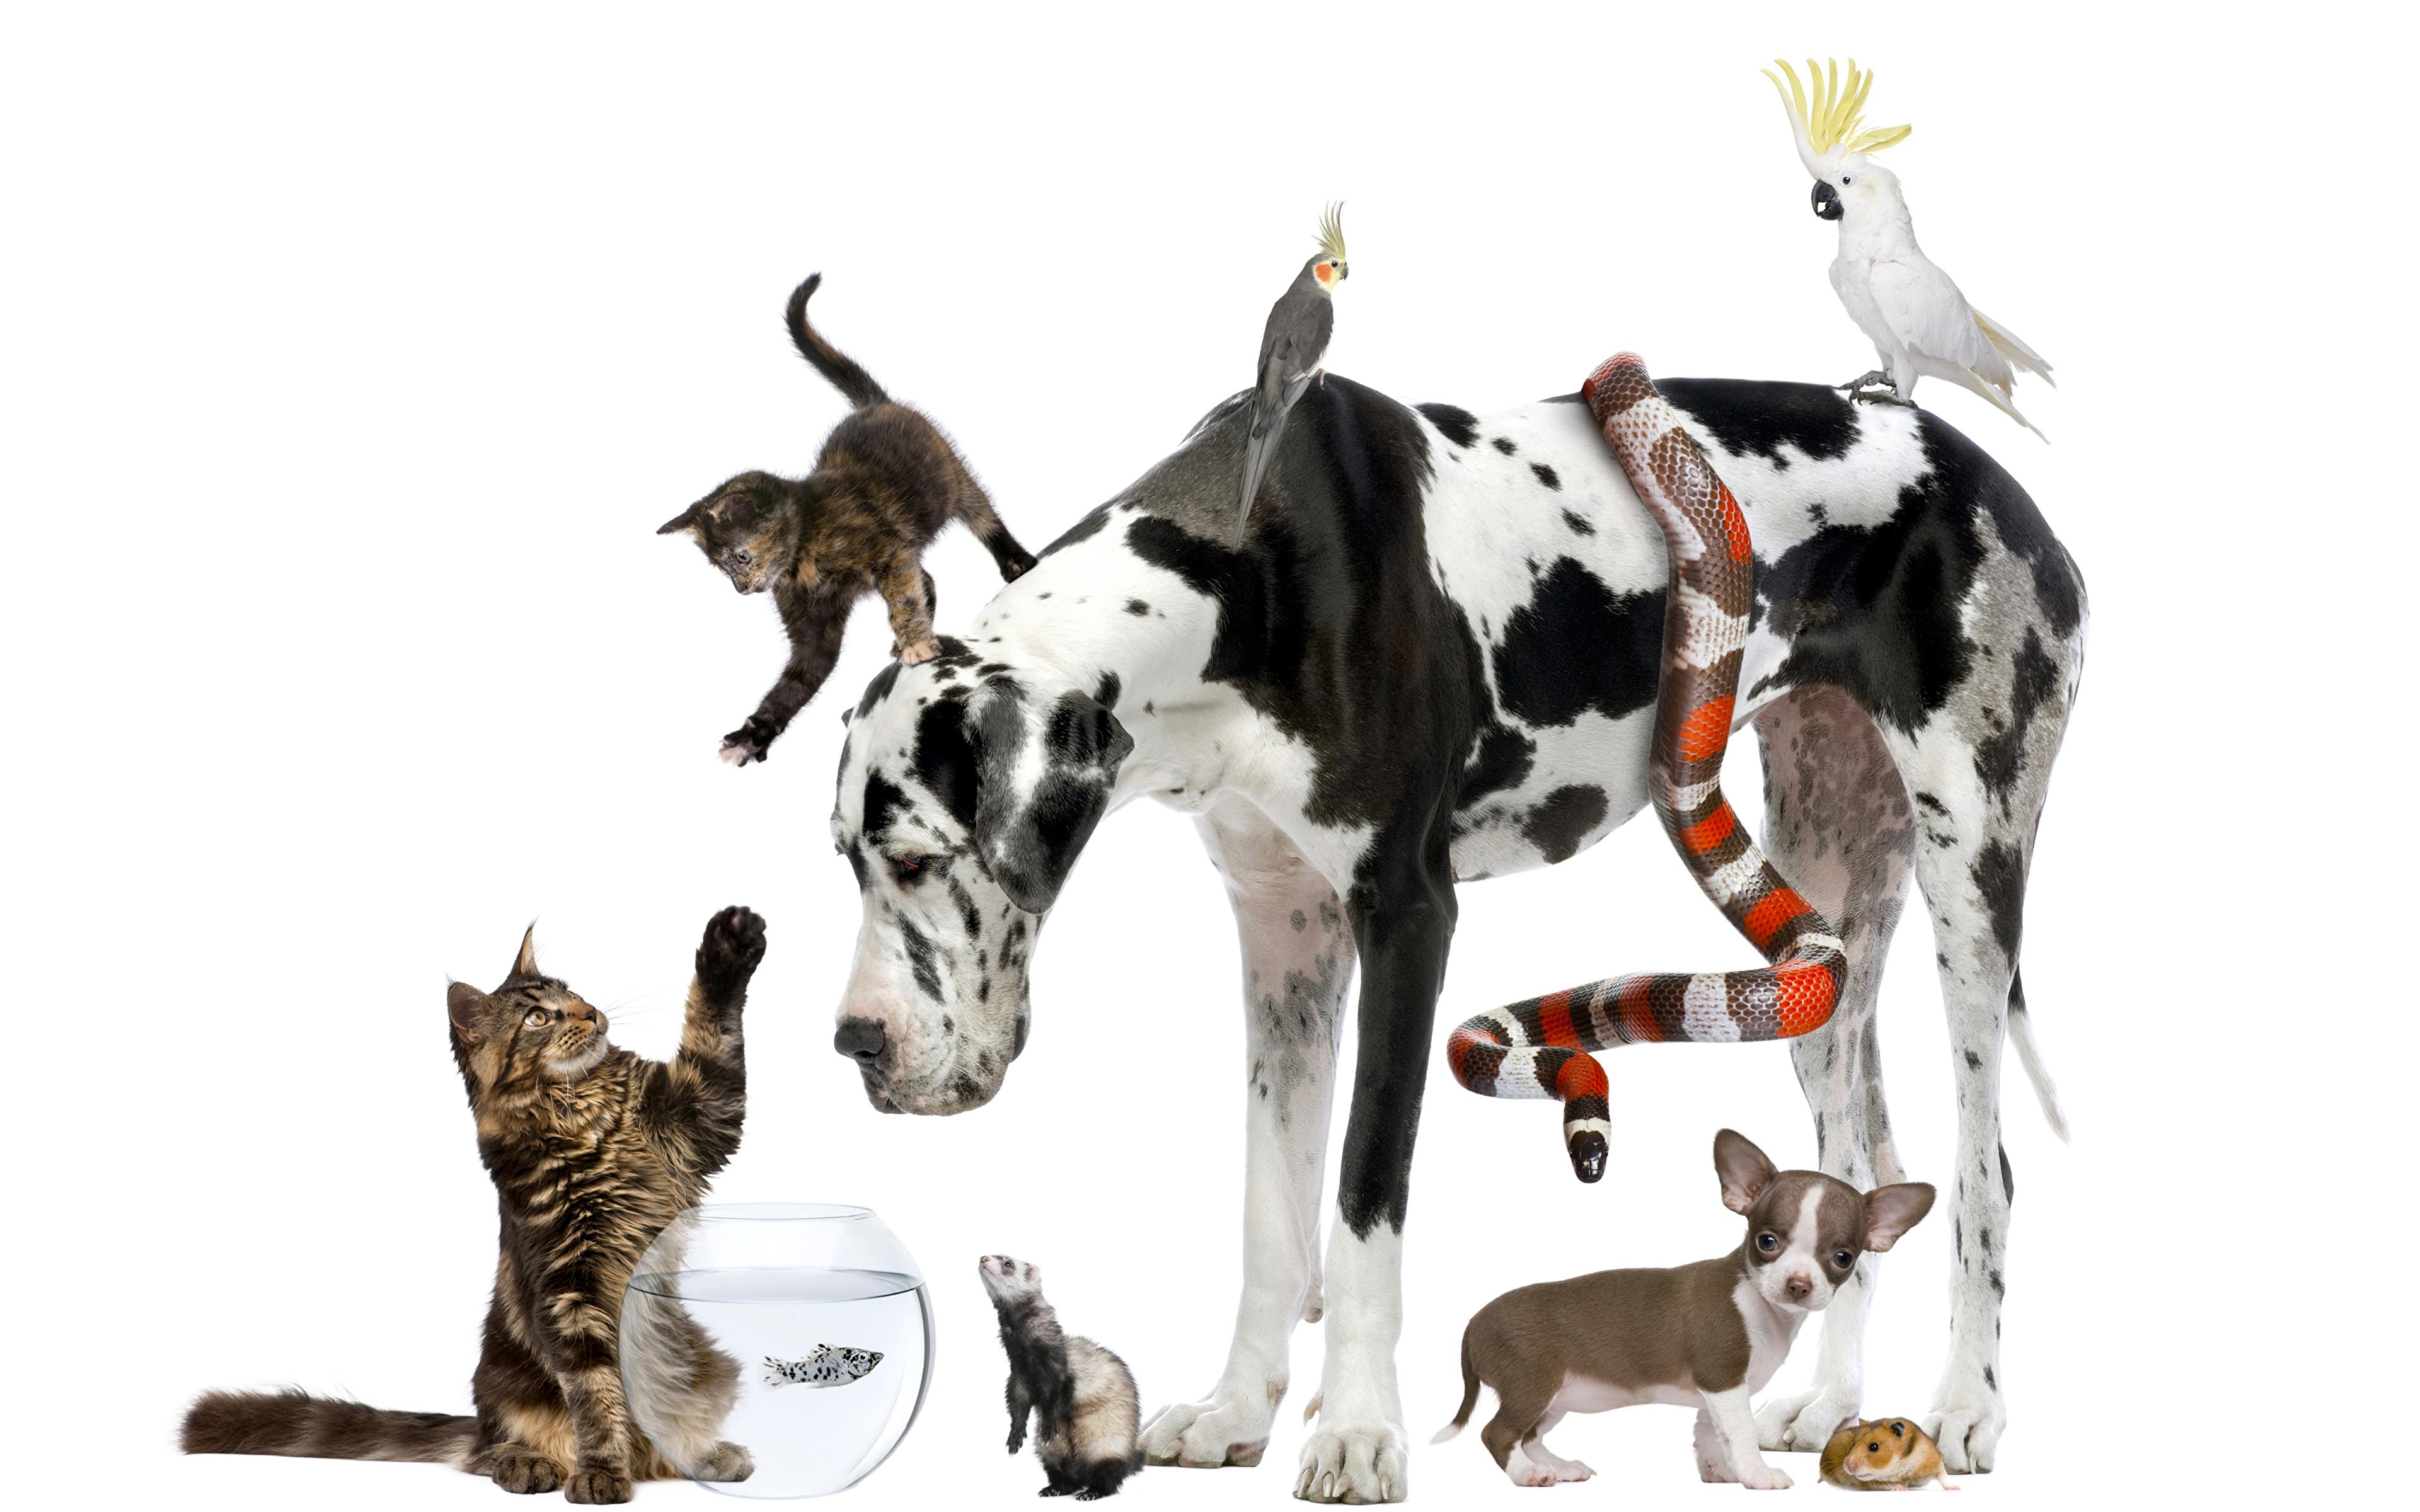 Картинка котят Еноты щенка Чихуахуа далматинцев кот Змеи собака Попугаи Морские свинки животное белом фоне 3840x2400 щенки Щенок Котята щенков котенка котенок Далматин далматинца Далматинец коты Кошки кошка Собаки Животные Белый фон белым фоном